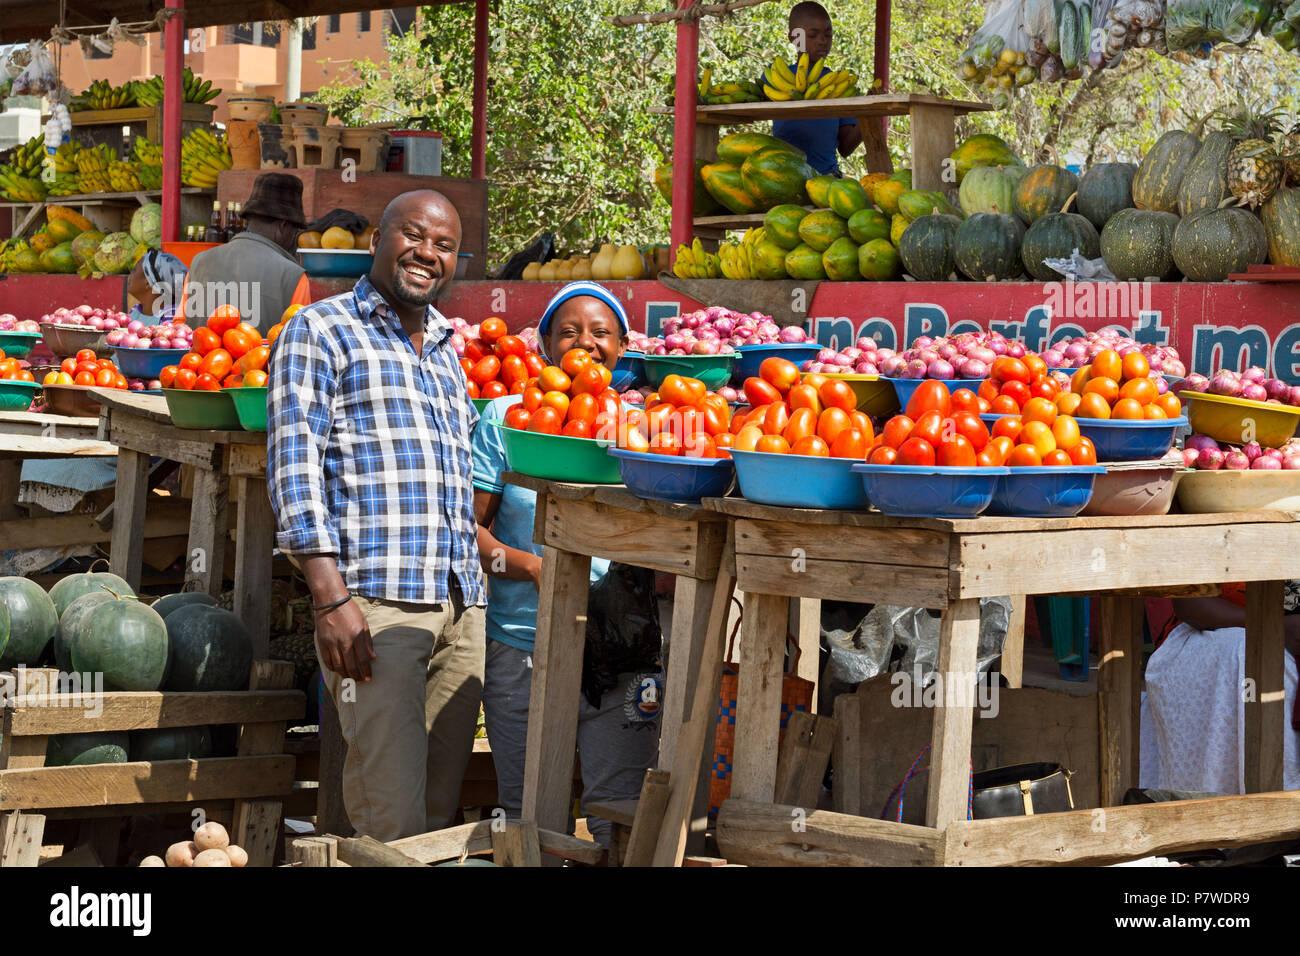 Street Vendors, Roadside Fruit and Vegetable Market, Ankole region, Uganda, East Africa - Stock Image